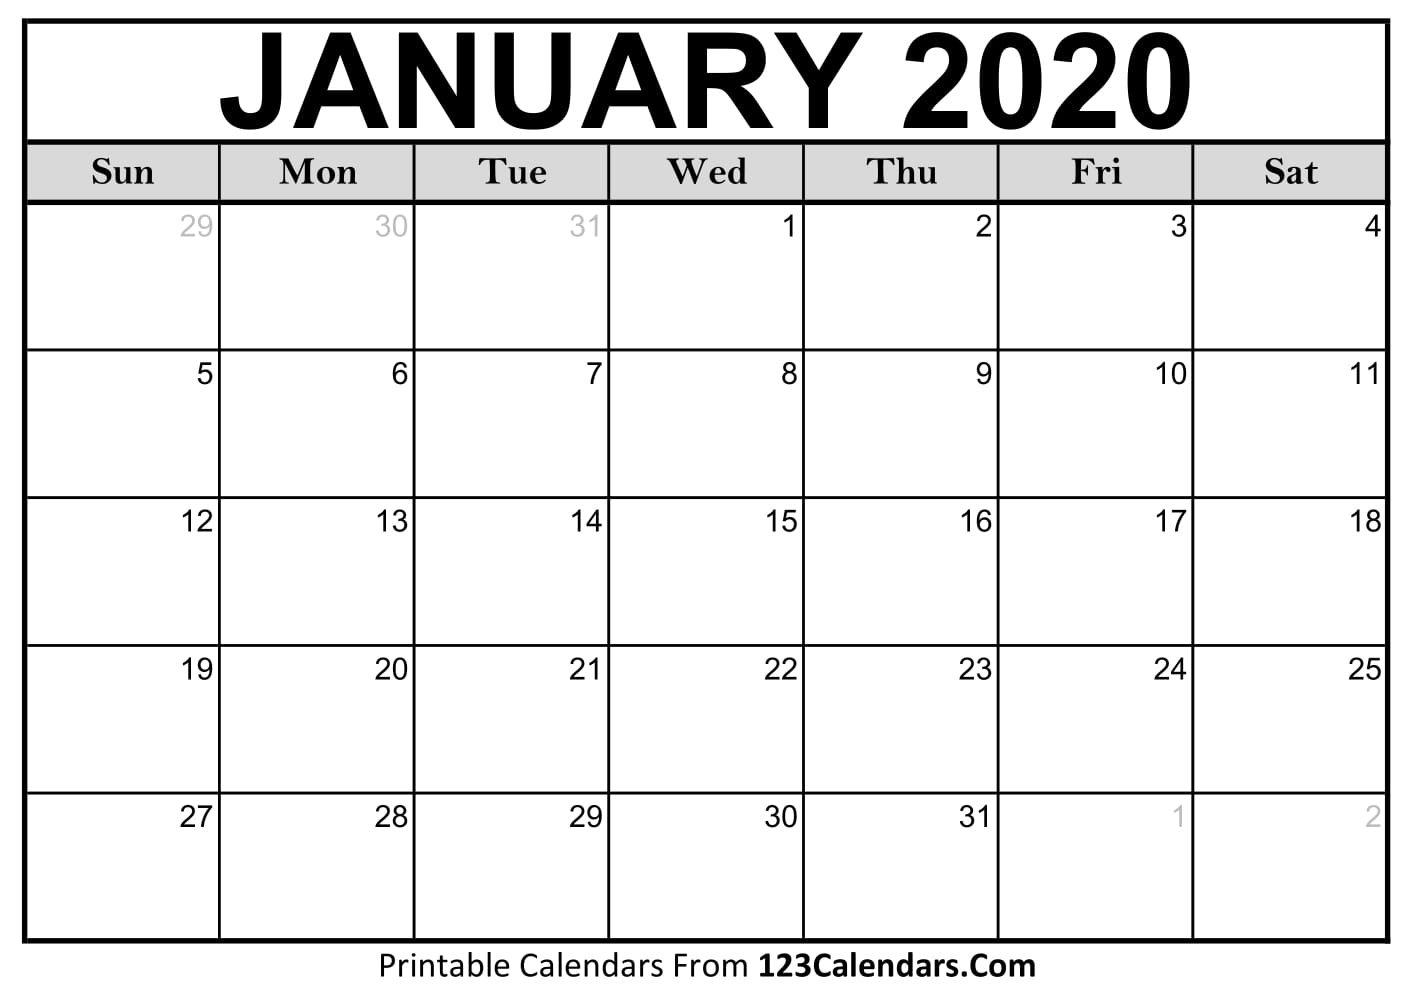 January 2020 Printable Calendar   123Calendars Calendar 2019 January Printable